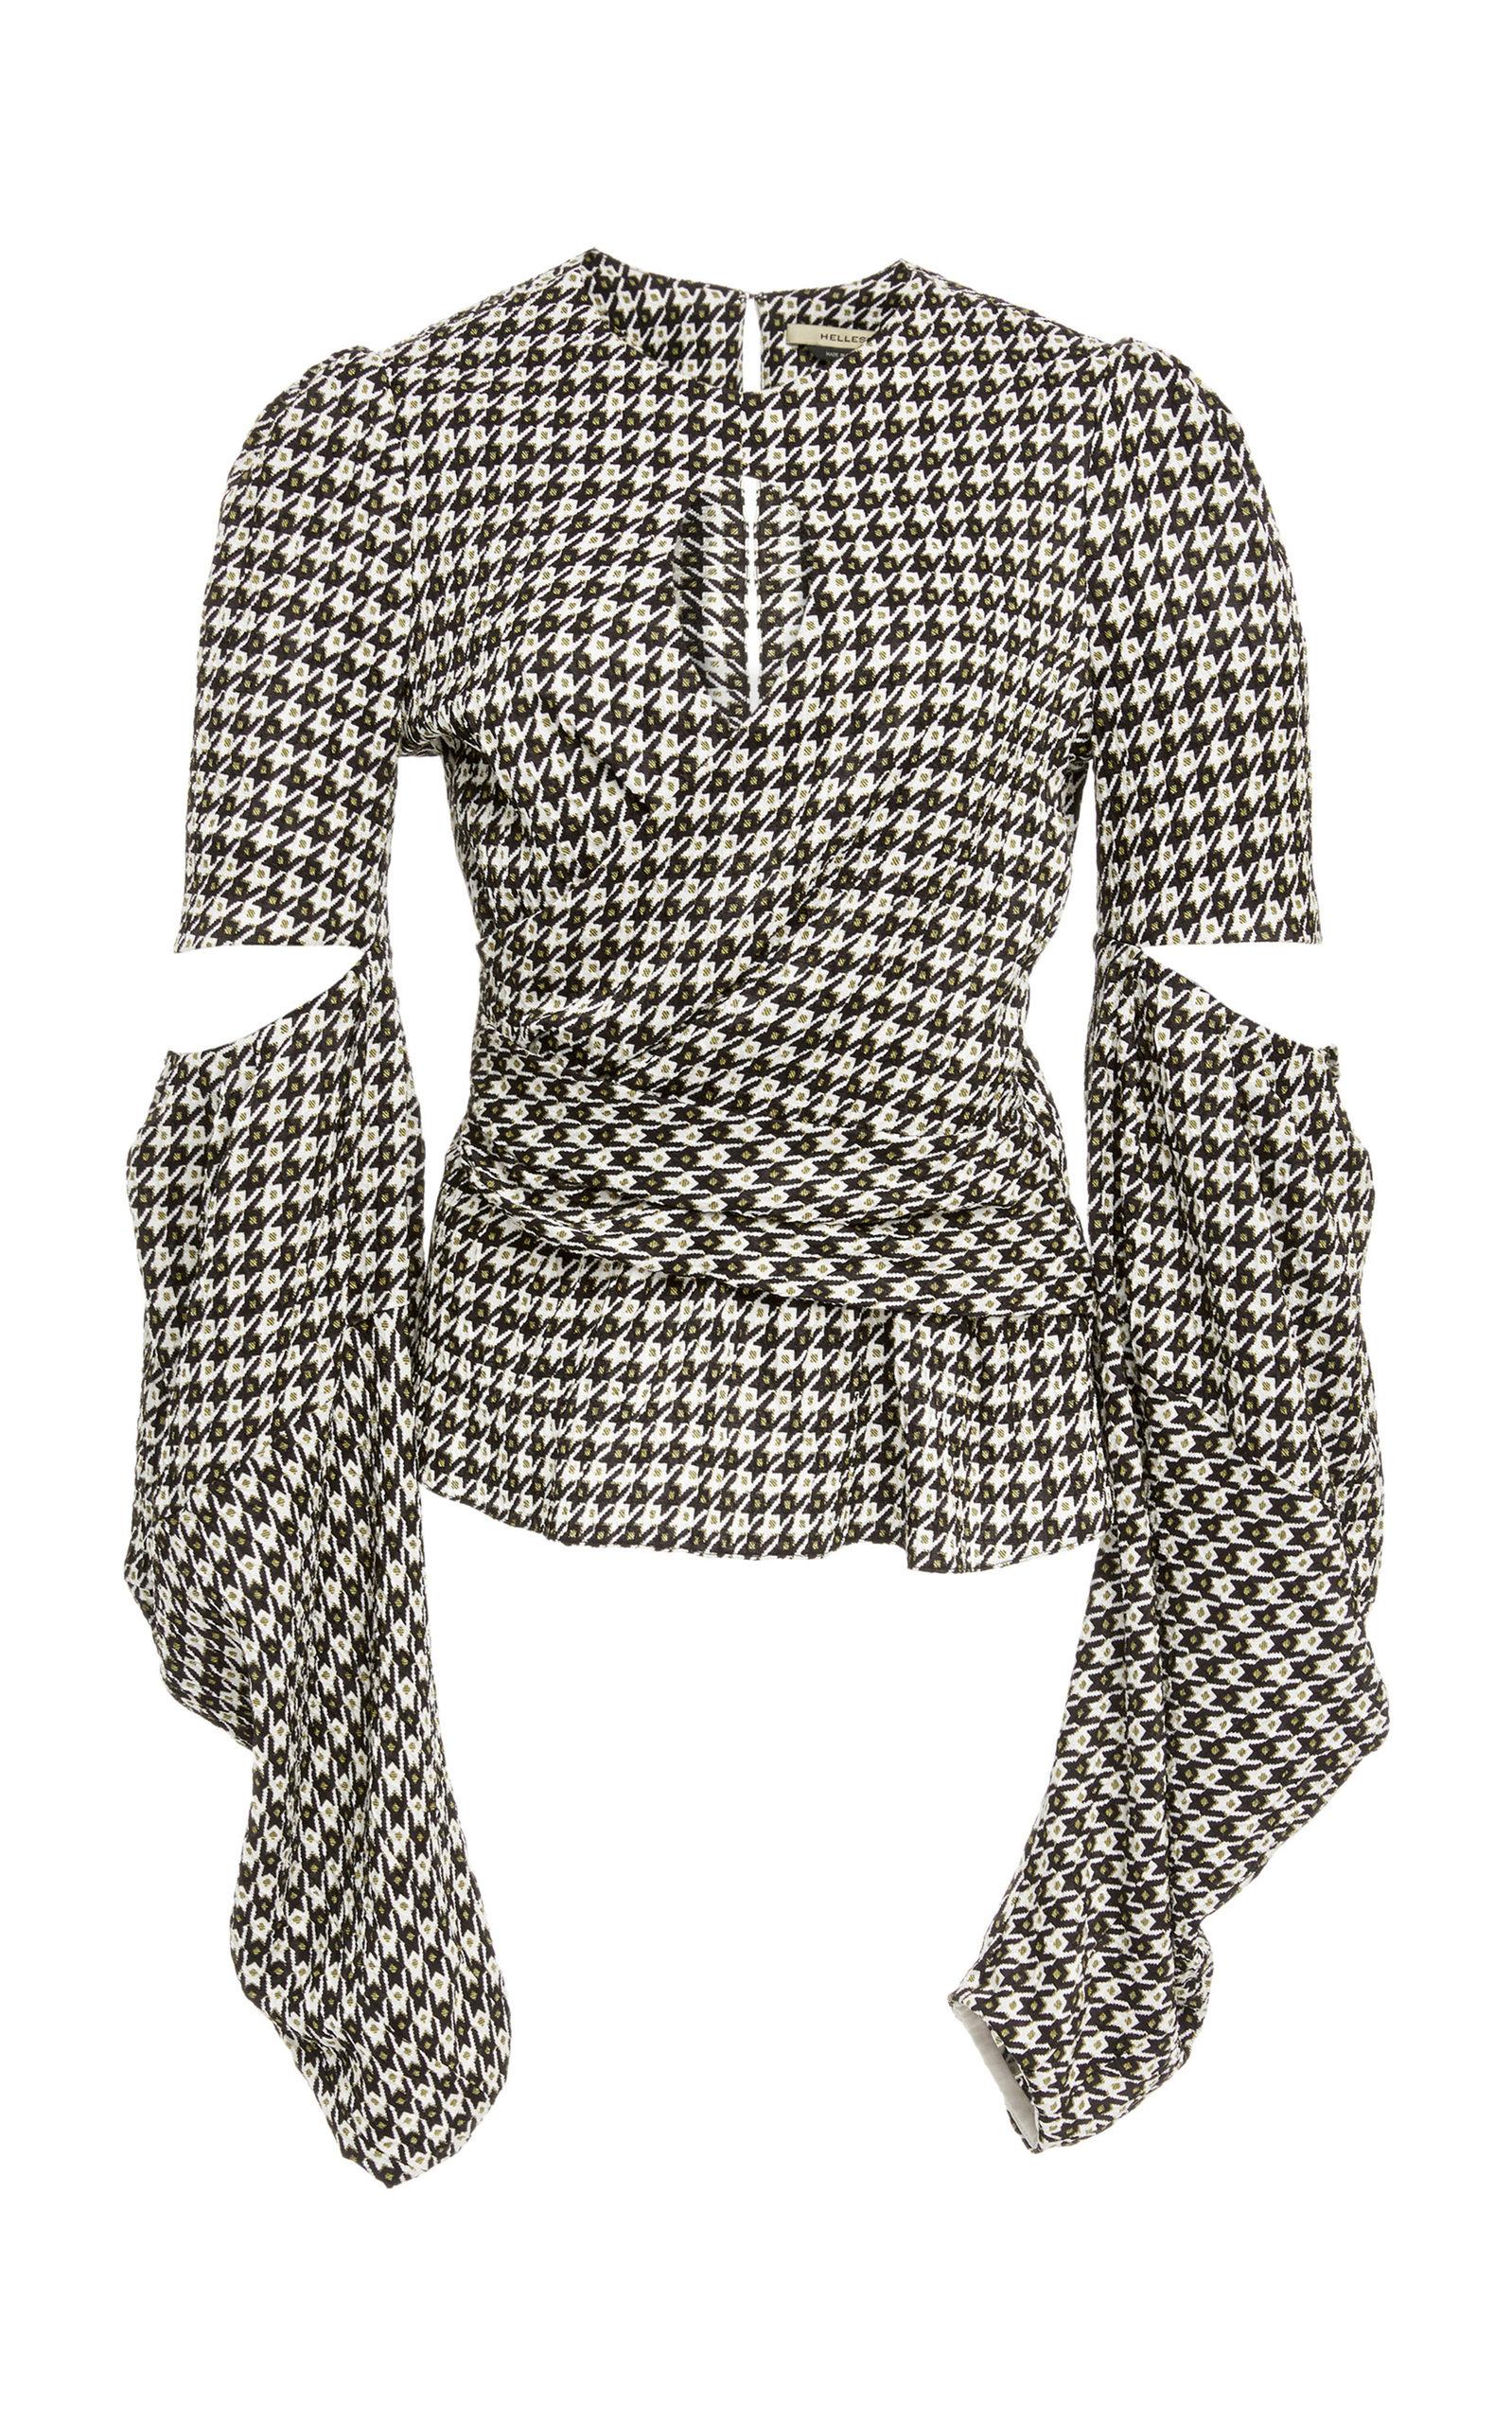 e92bdf4a48f9 large hellessy-black-white-celeste-cutout-houndstooth-jacquard-blouse.jpg